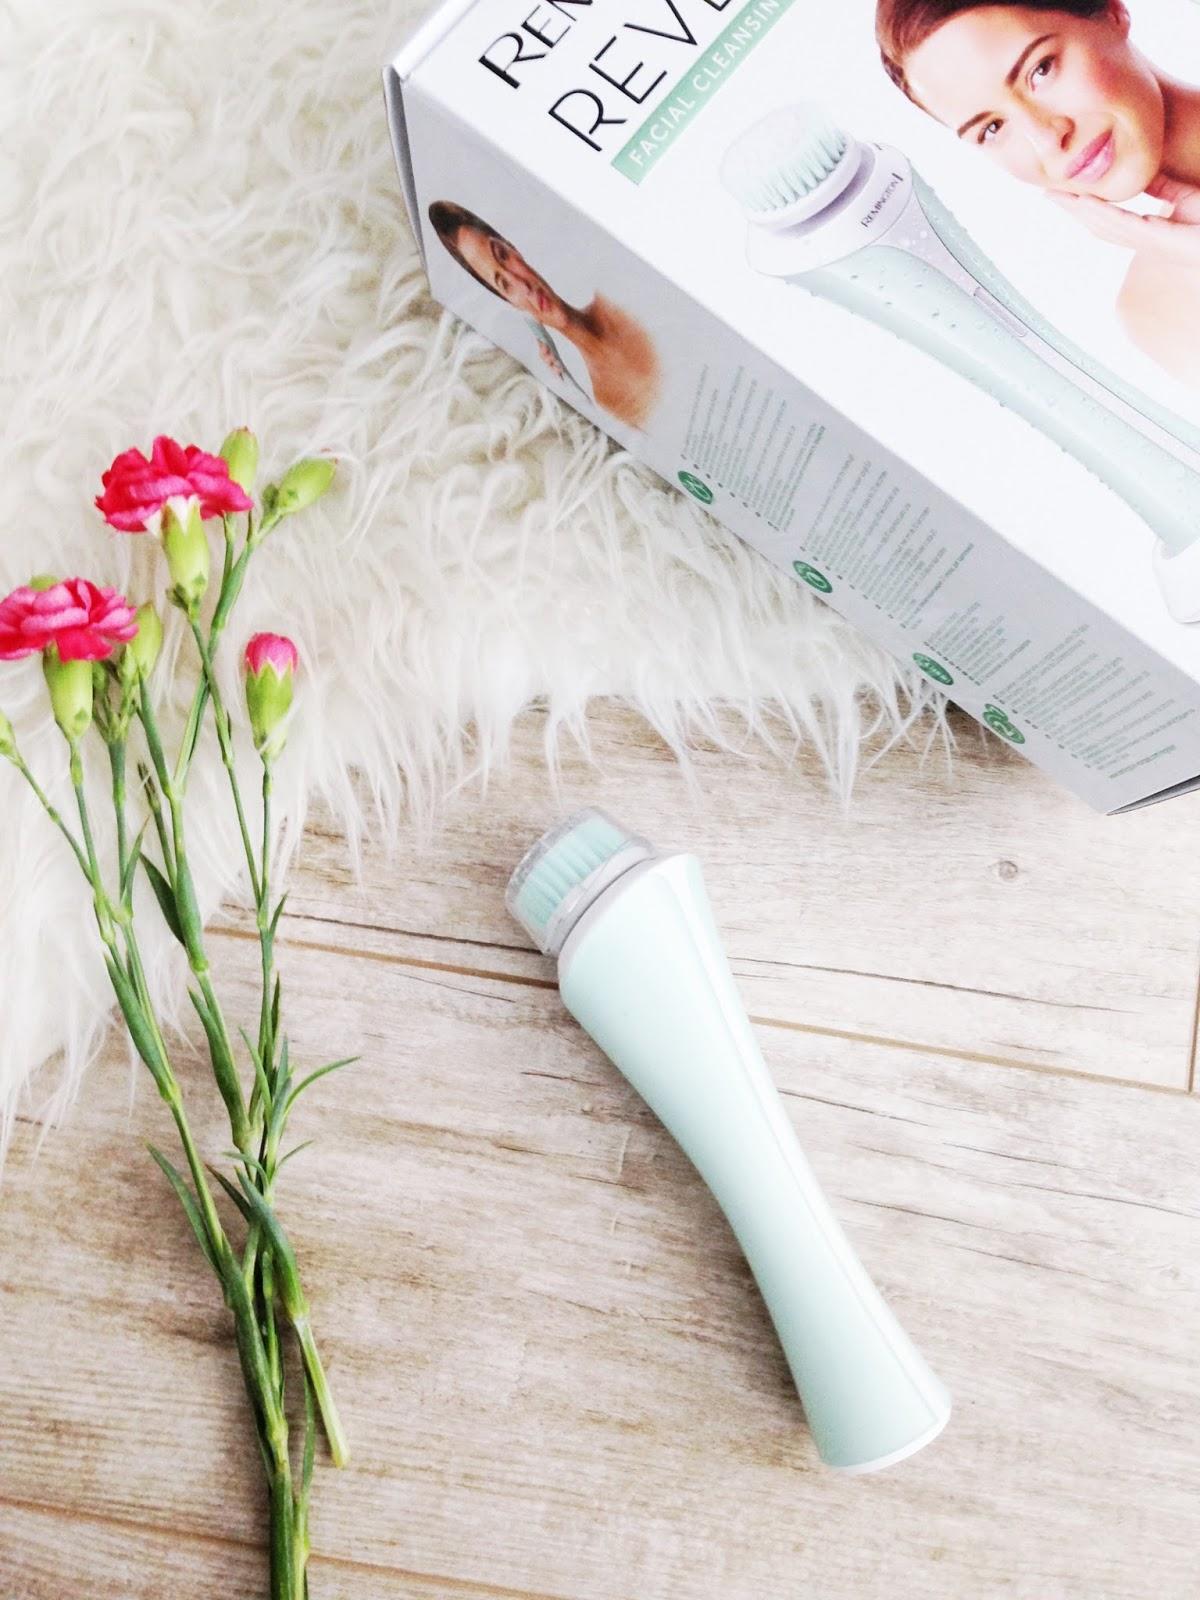 Remington Reveal facial cleansing brush